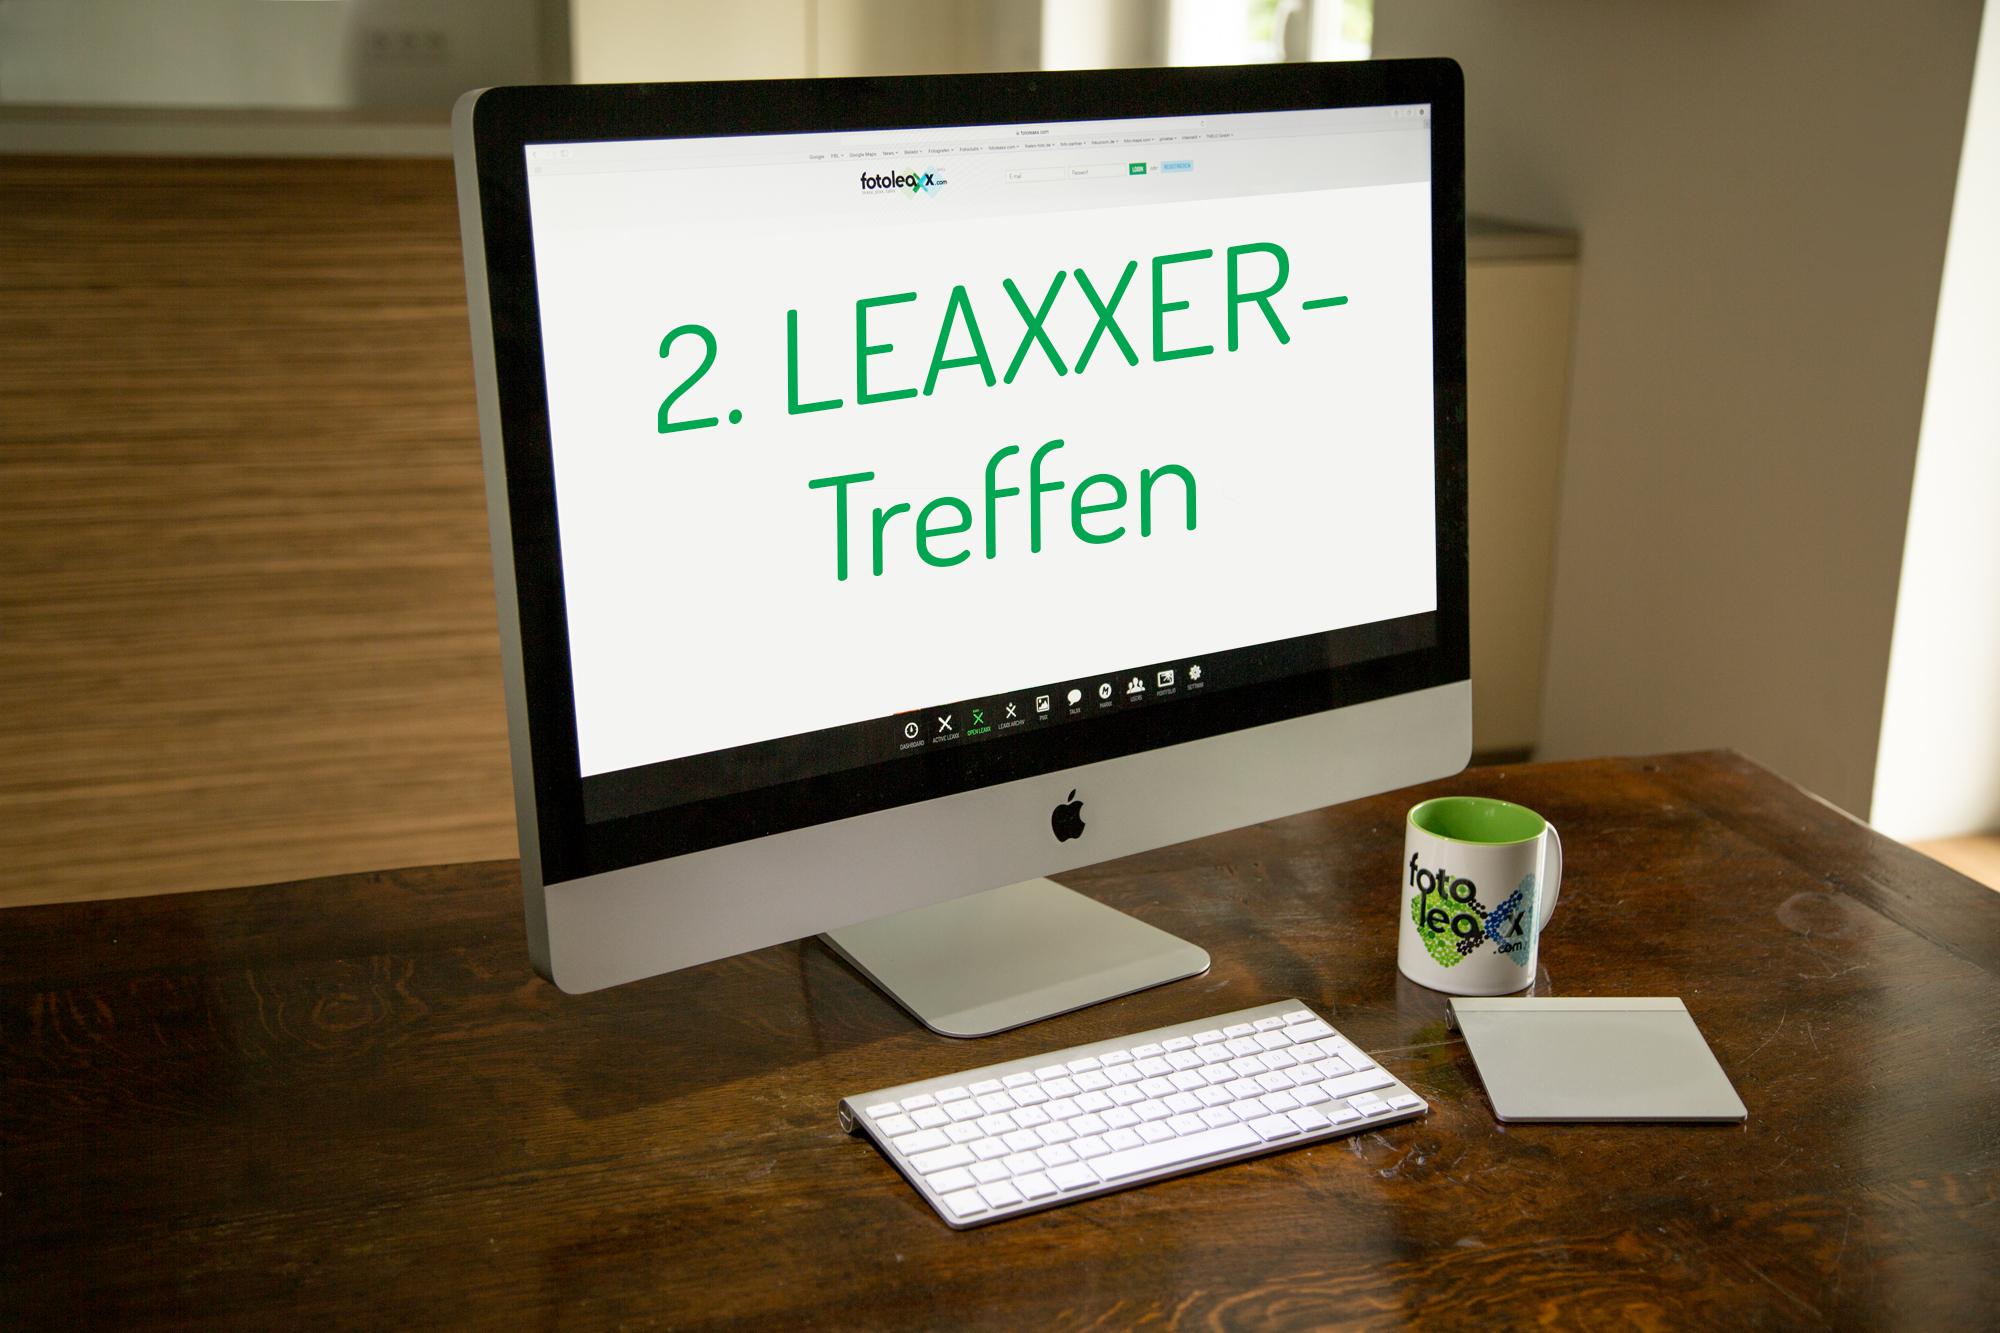 2. LEAXXER-TREFFEN